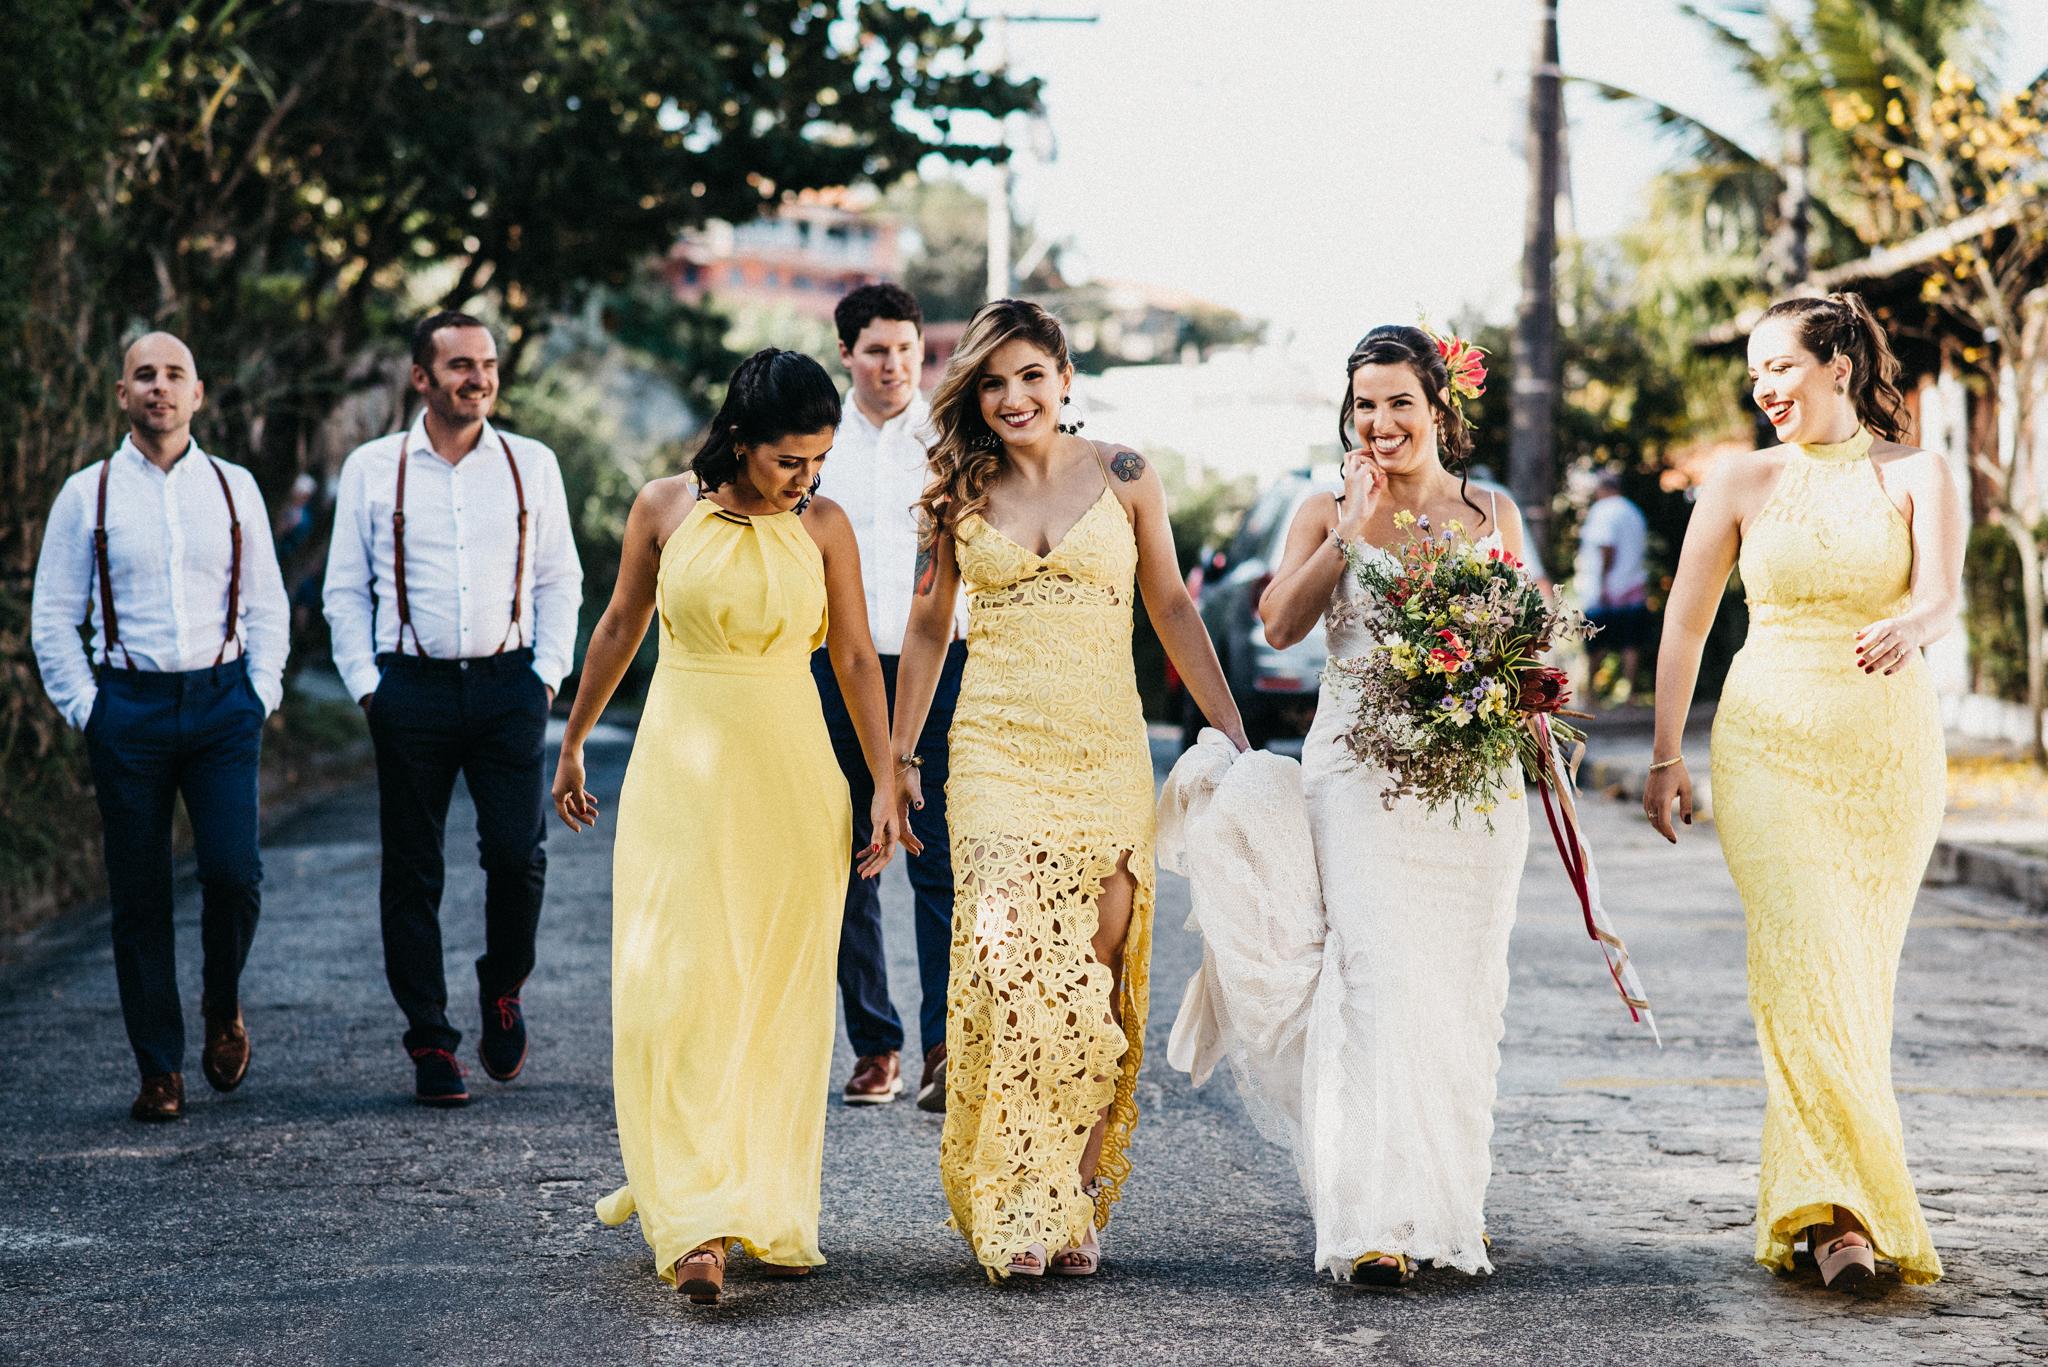 2018.08 Casamento Priscila Barros e Patrizio 0019.jpg